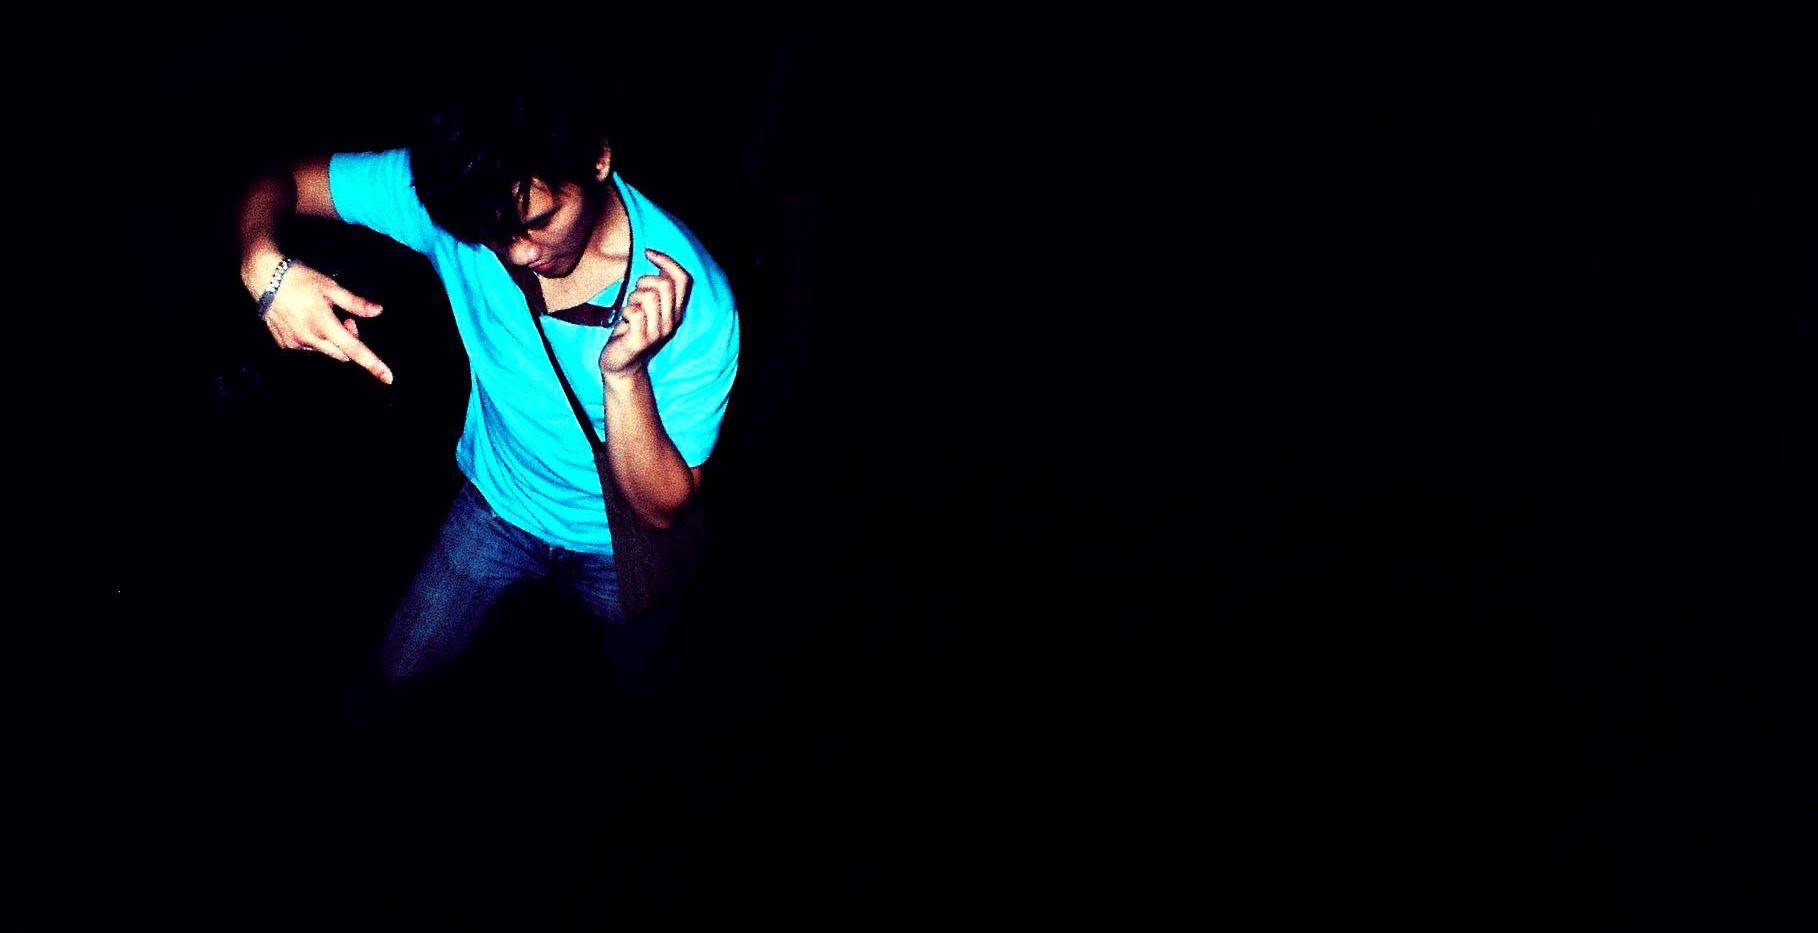 EADJ Blue Shirt Dancing.jpg